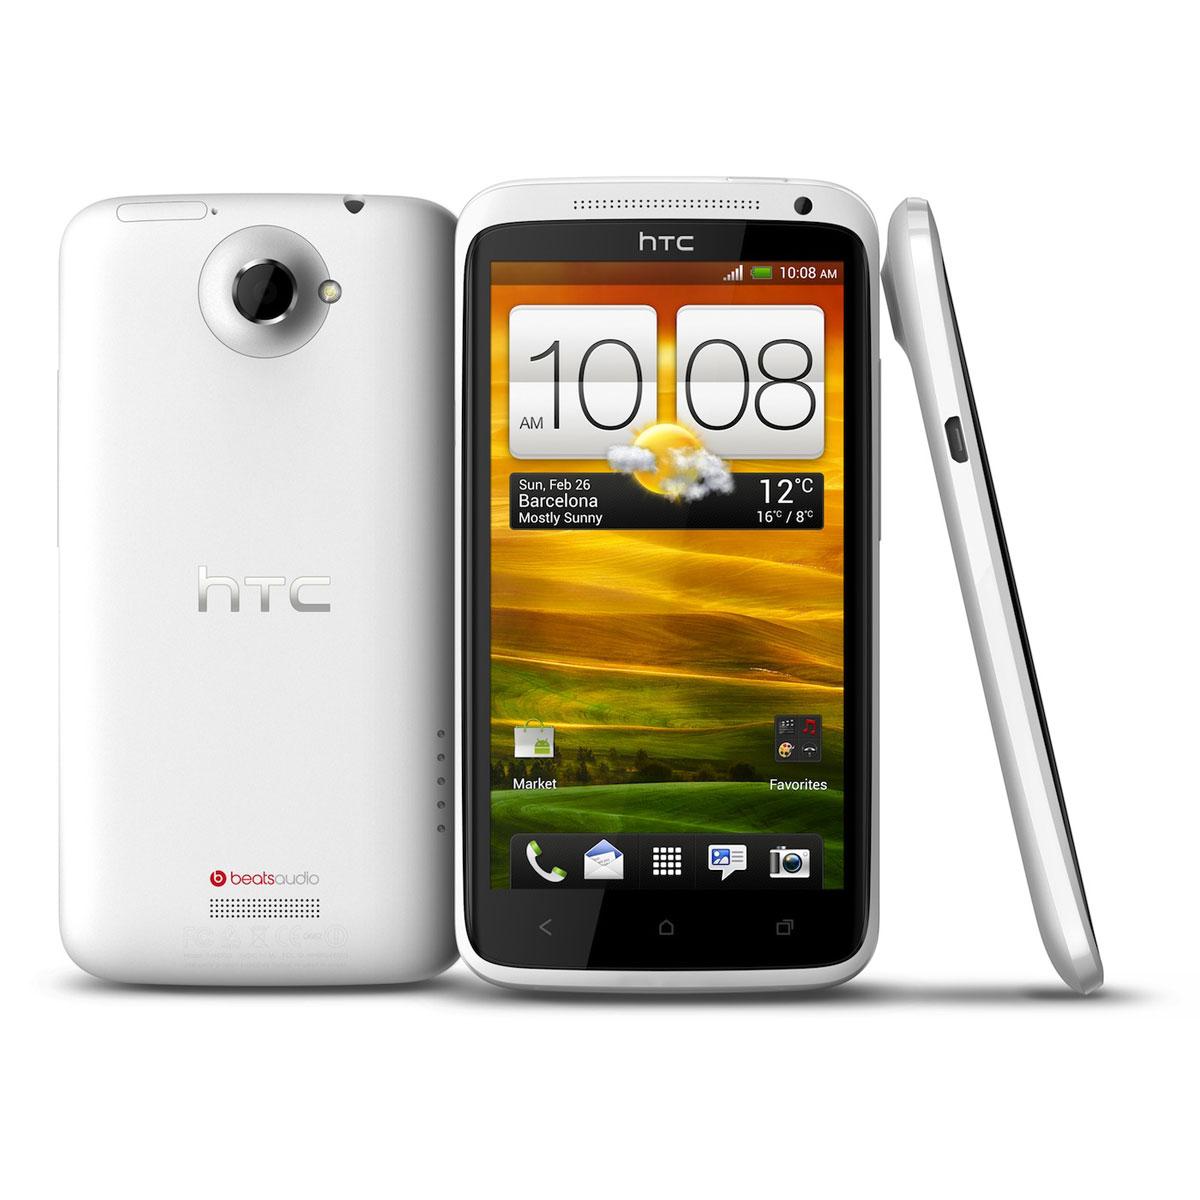 "Mobile & smartphone HTC One X Blanc 32 Go Smartphone 3G+ avec écran tactile 4.7"" sous Android 4.0"